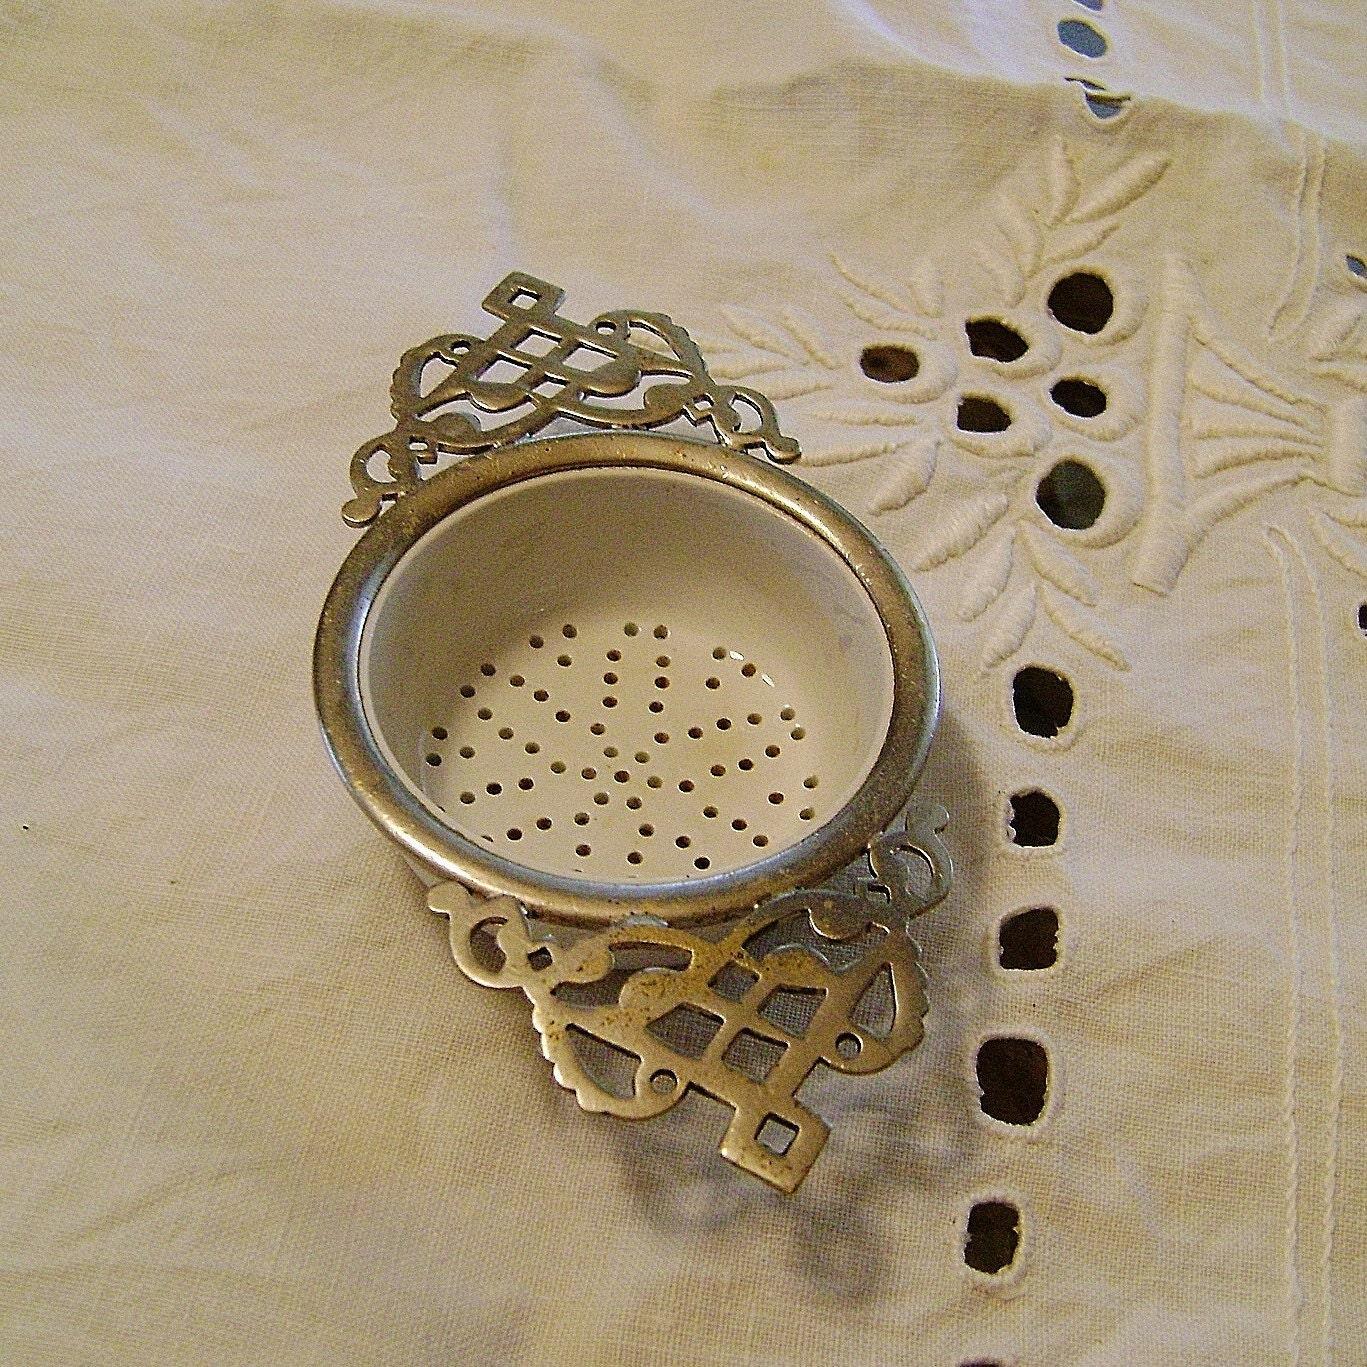 Antique Scroll Work: Antique Enamel Porcelain Scroll Work Tea By SilverFoxAntiques